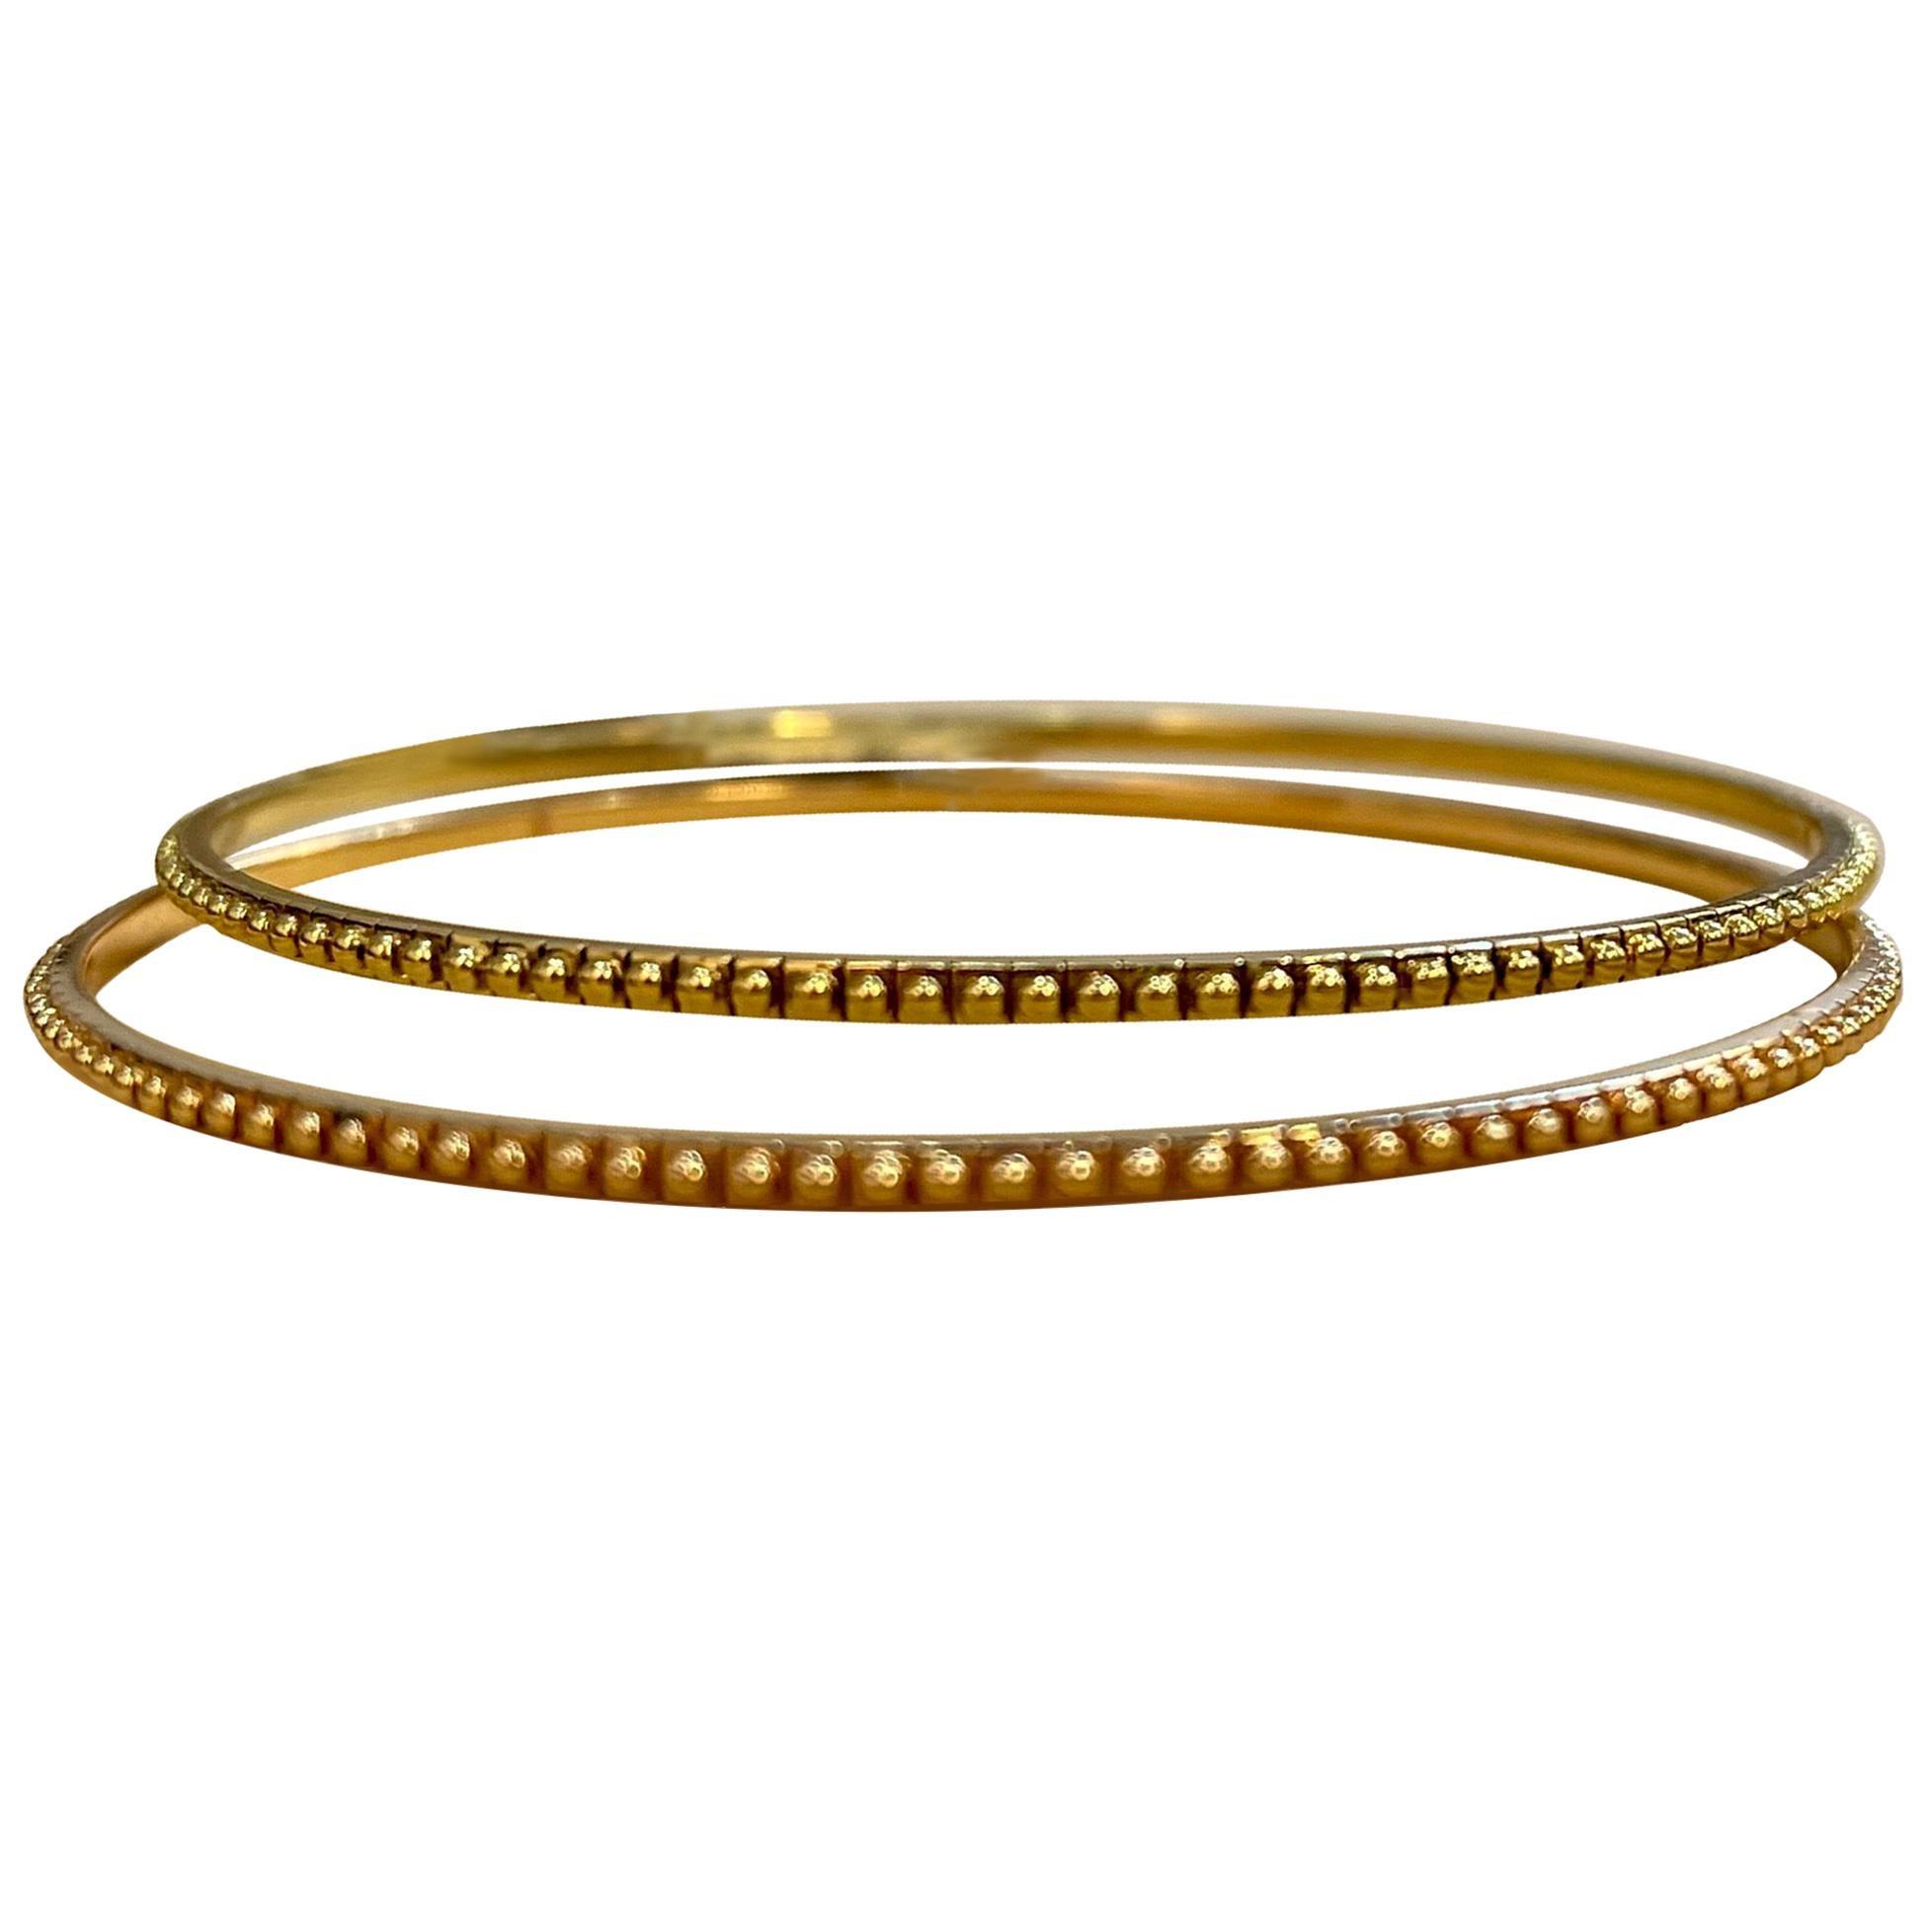 Contemporary Yellow and Rose Gold 18 Karat Gold Bangle Bracelet